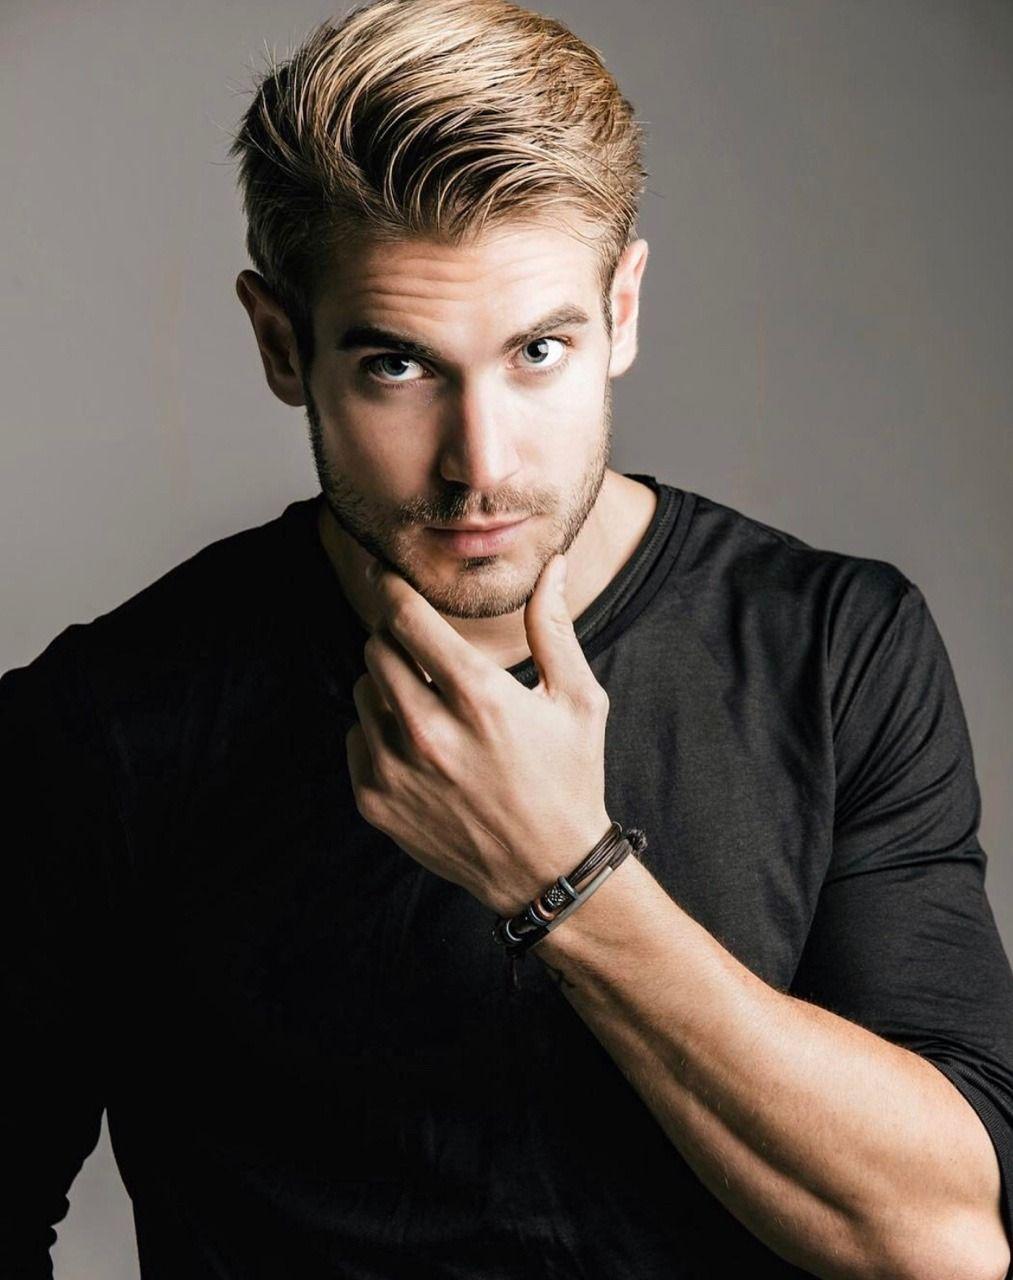 Salazar Photography Poses For Men Blonde Male Models